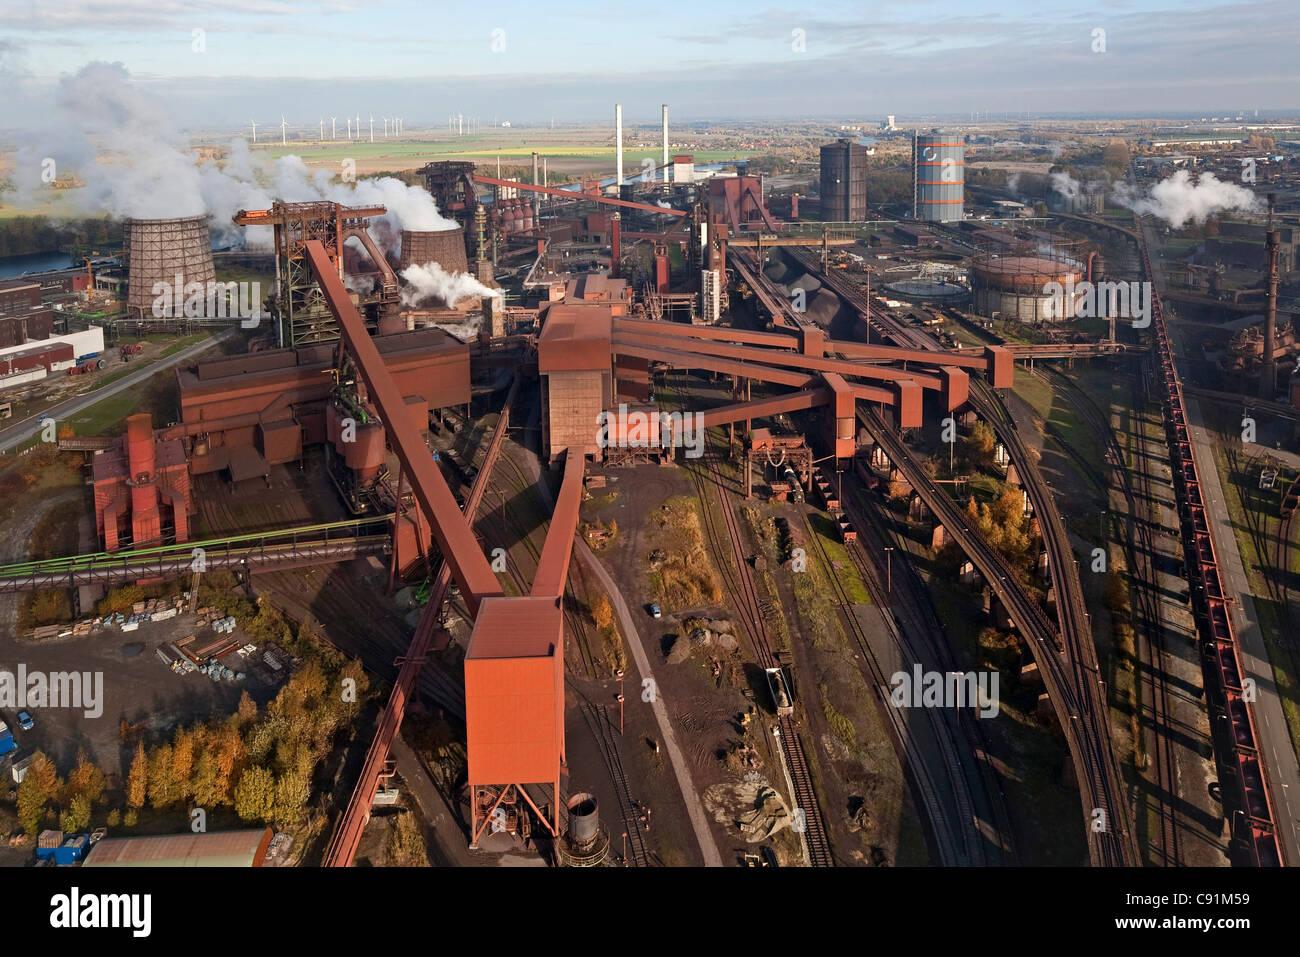 Aerial of Salzgitter Steelworks, Salzgitter, Lower Saxony, Germany - Stock Image